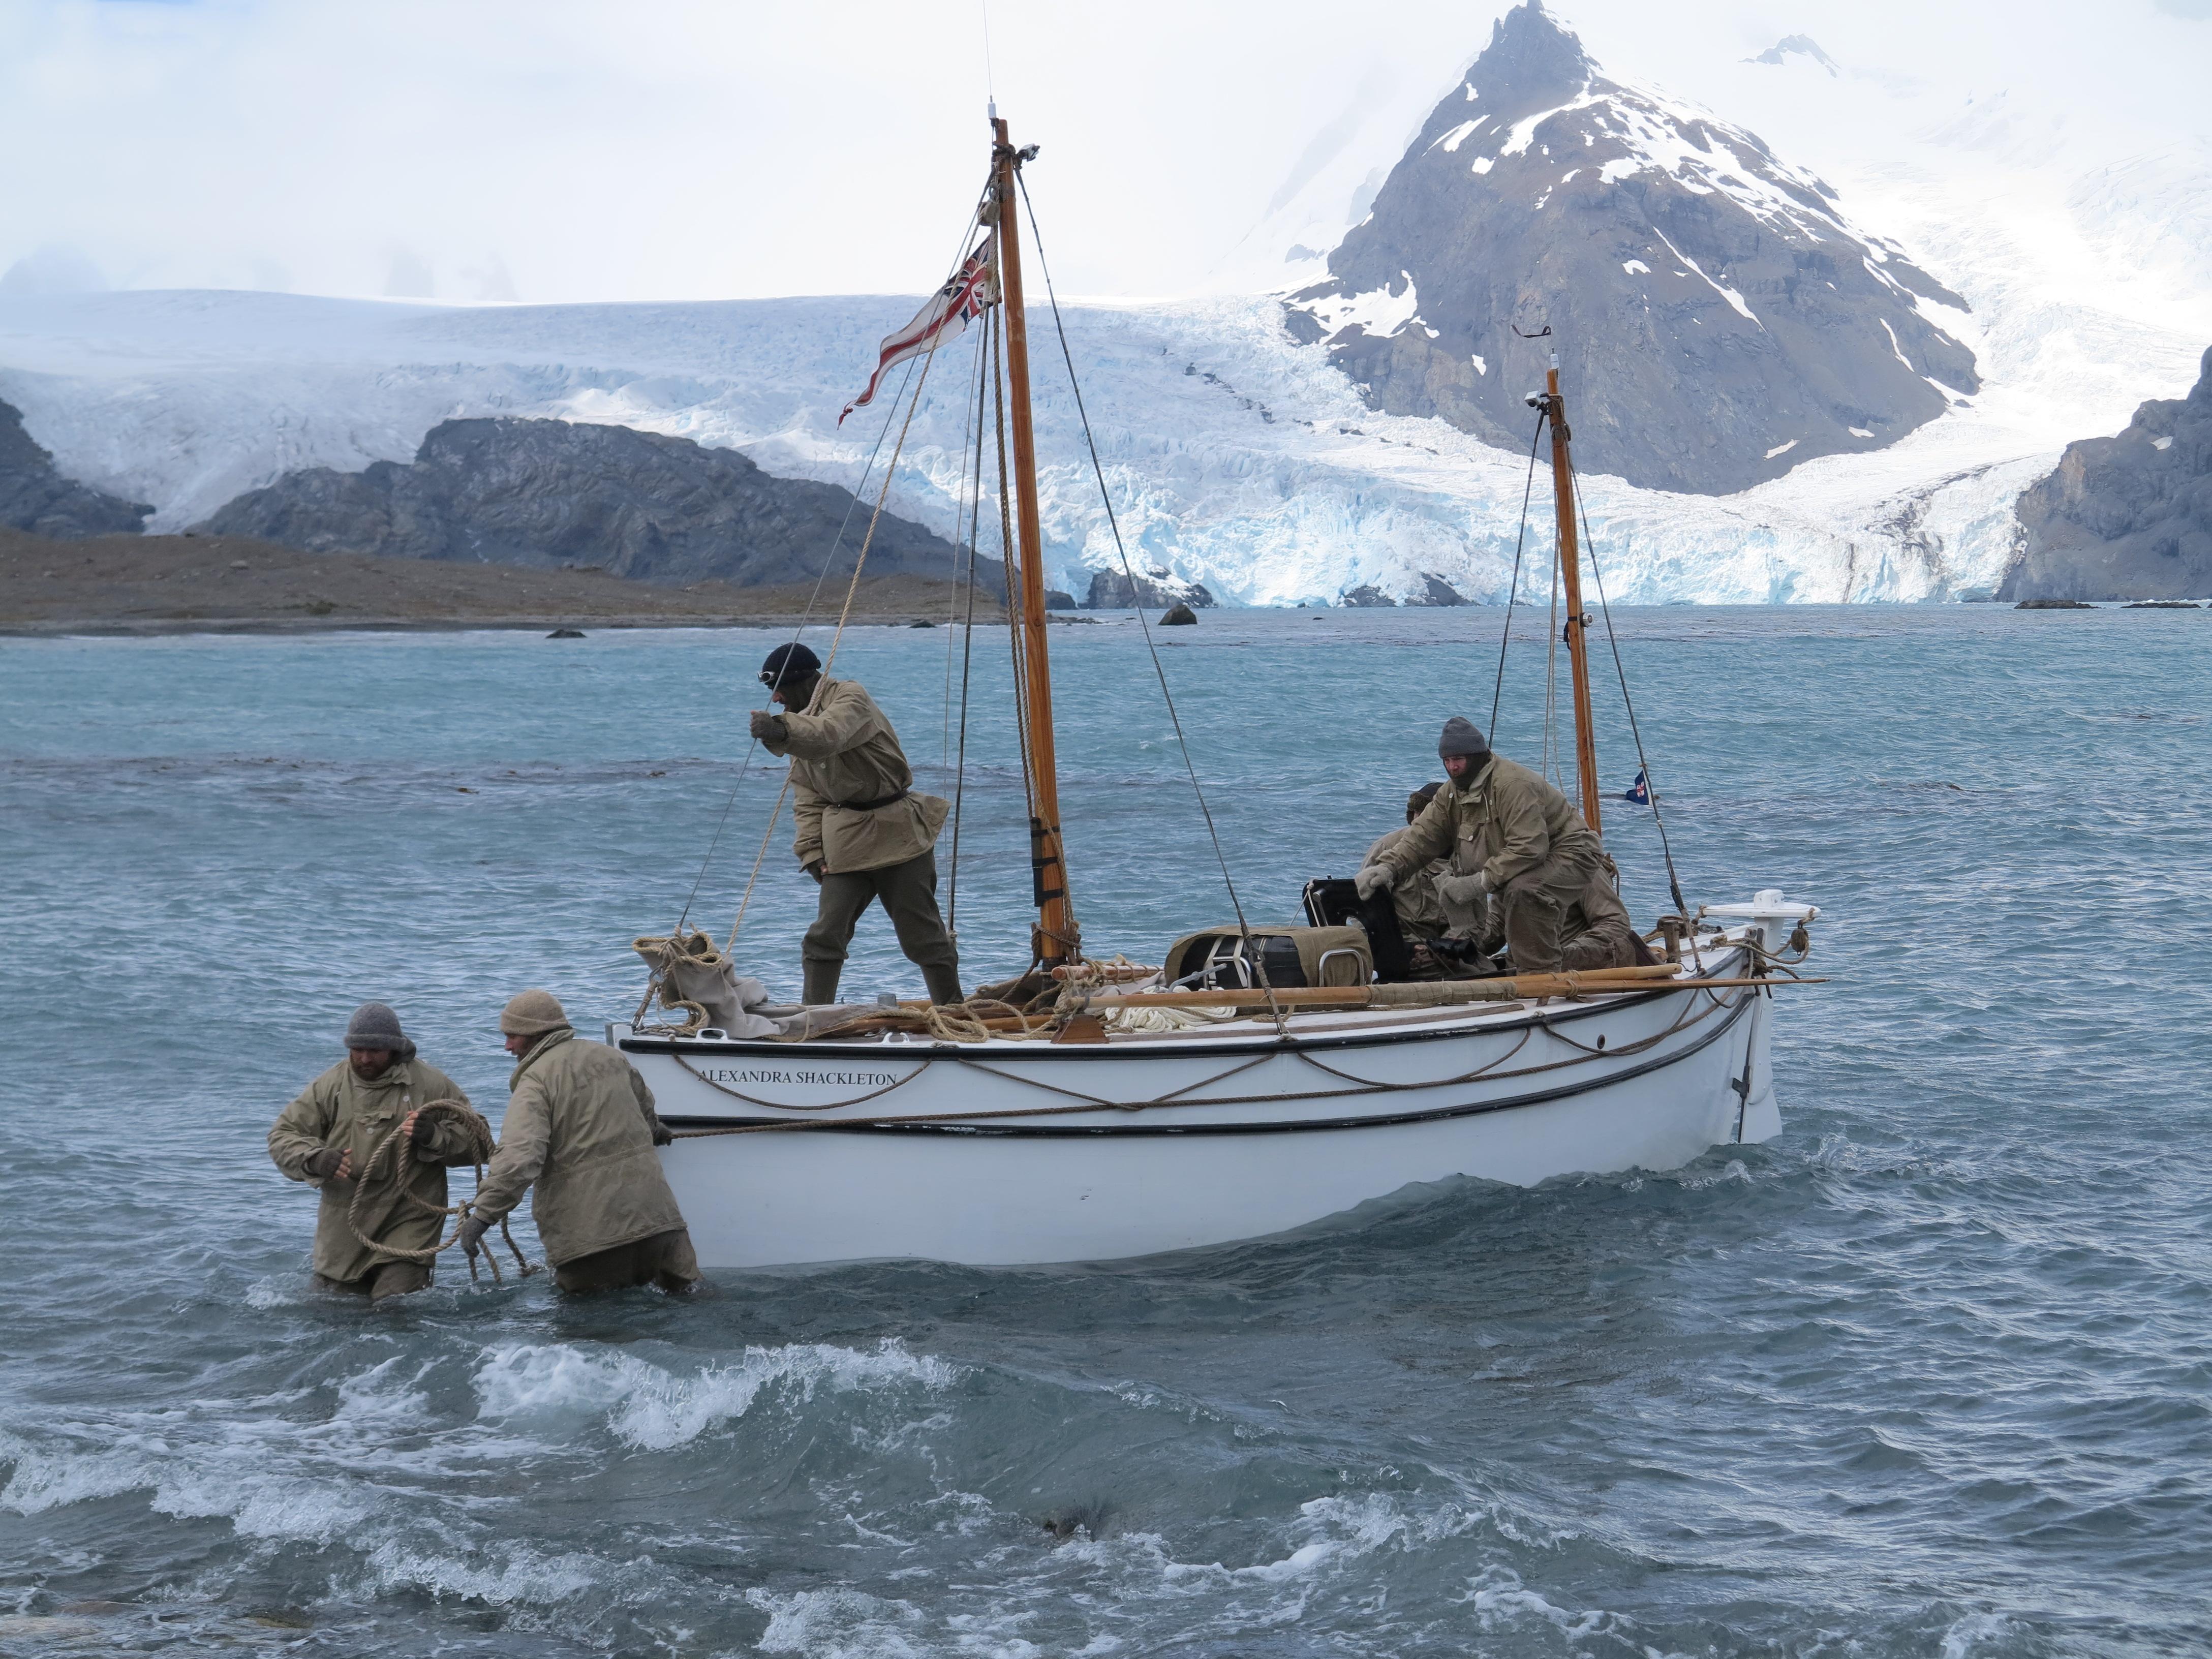 Shackleton Epic crew bringing Alexandra Shackleton onshore at South Georgia. Image Jo Stewart